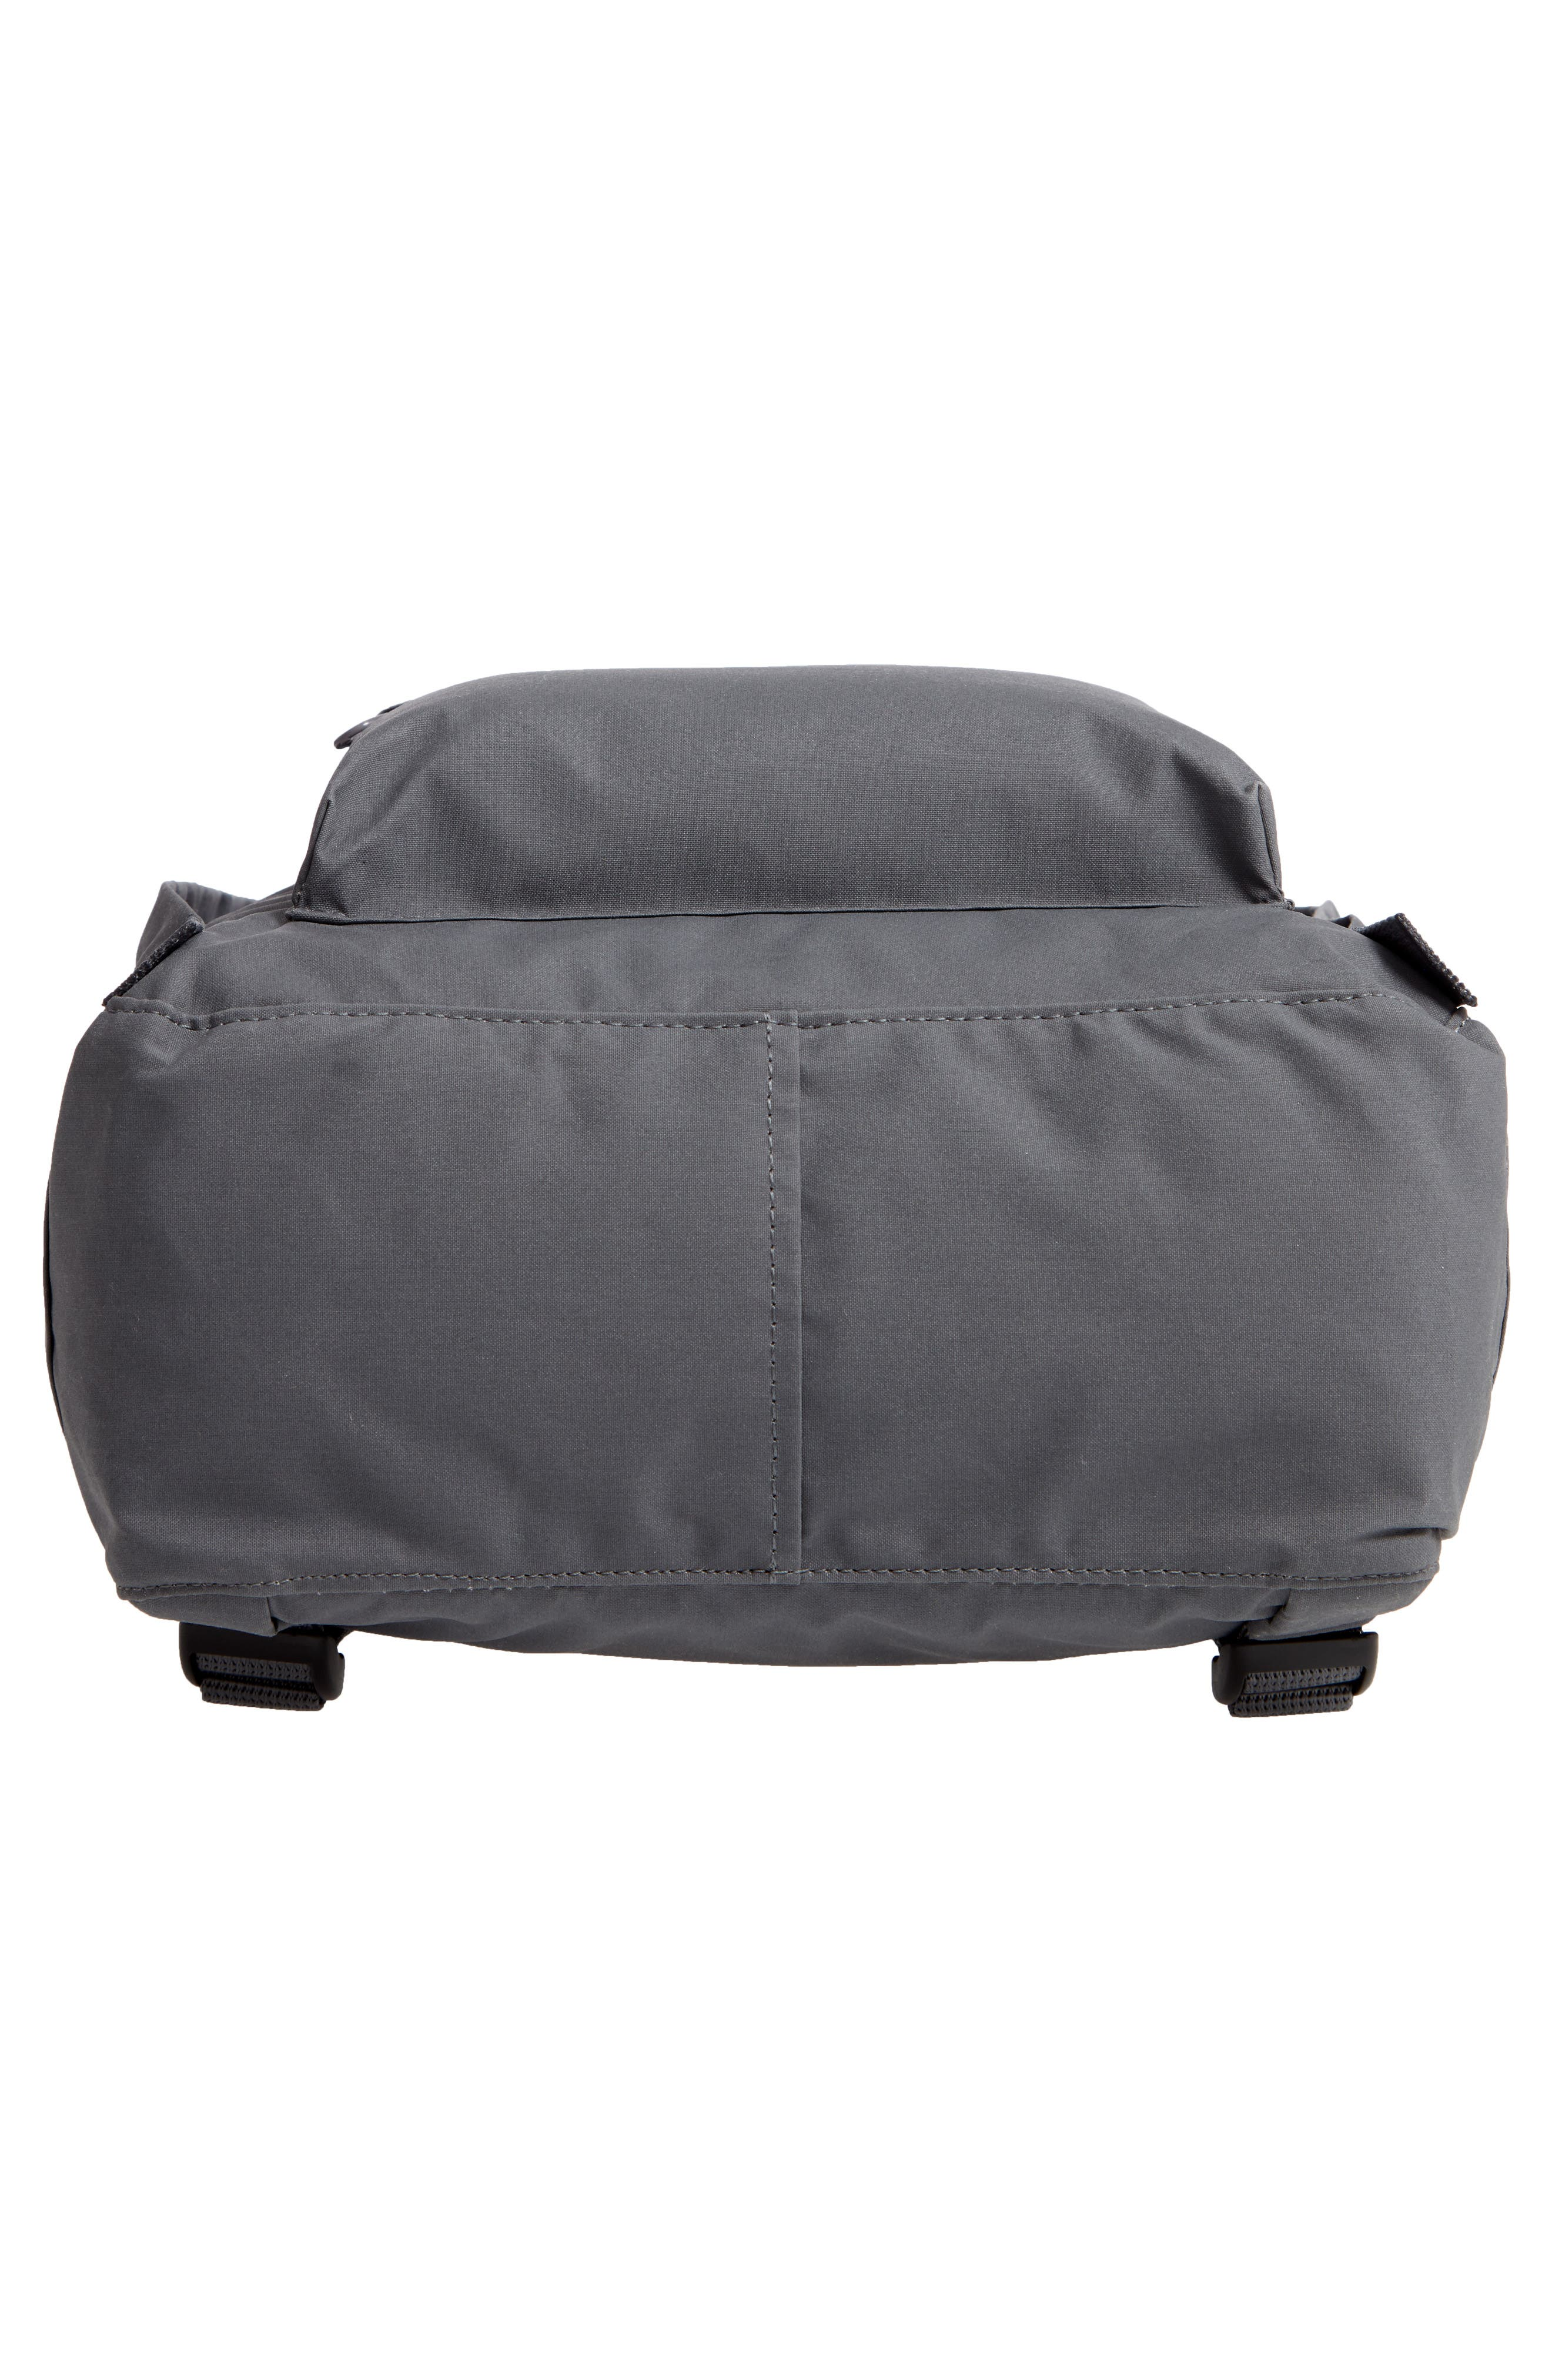 'Kånken' Water Resistant Backpack,                             Alternate thumbnail 304, color,